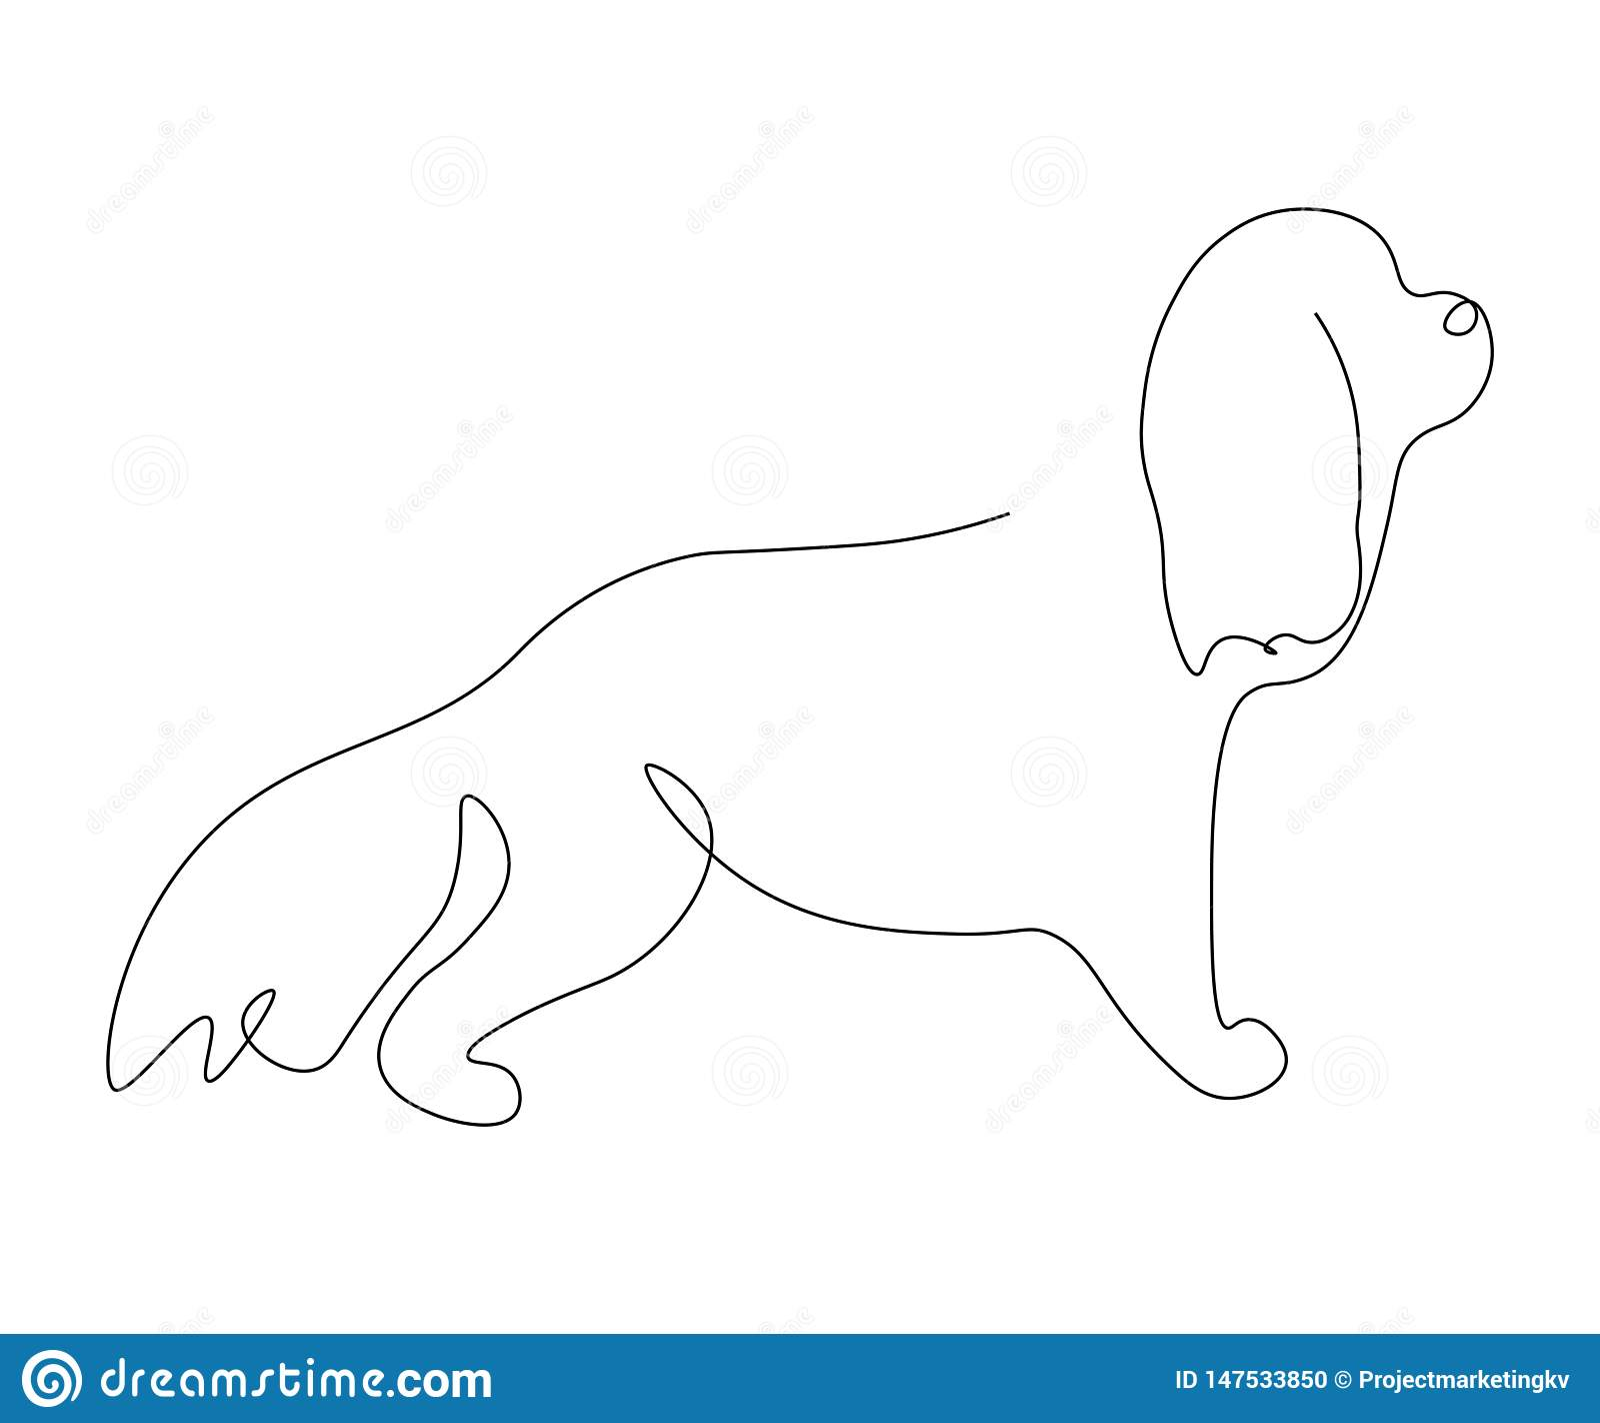 Cocker Spaniel Puppy Silhouette Line Drawing Vector Illustration Stock Vector Illustration Of Vector Logo 147533850